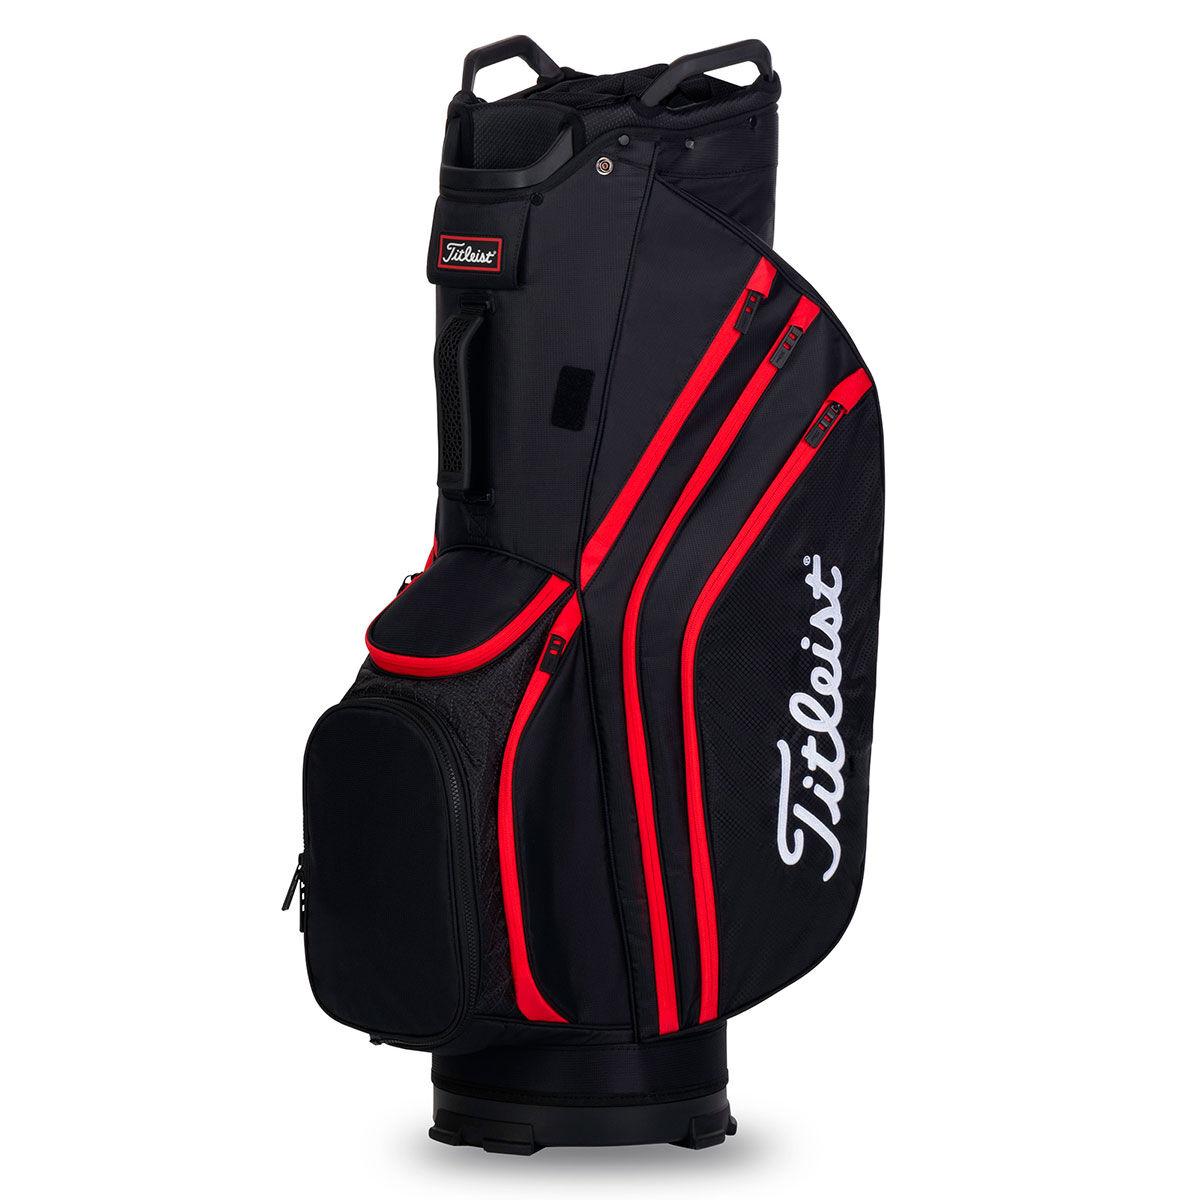 Titleist 14 Lightweight Golf Cart Bag, Black/black/red | American Golf